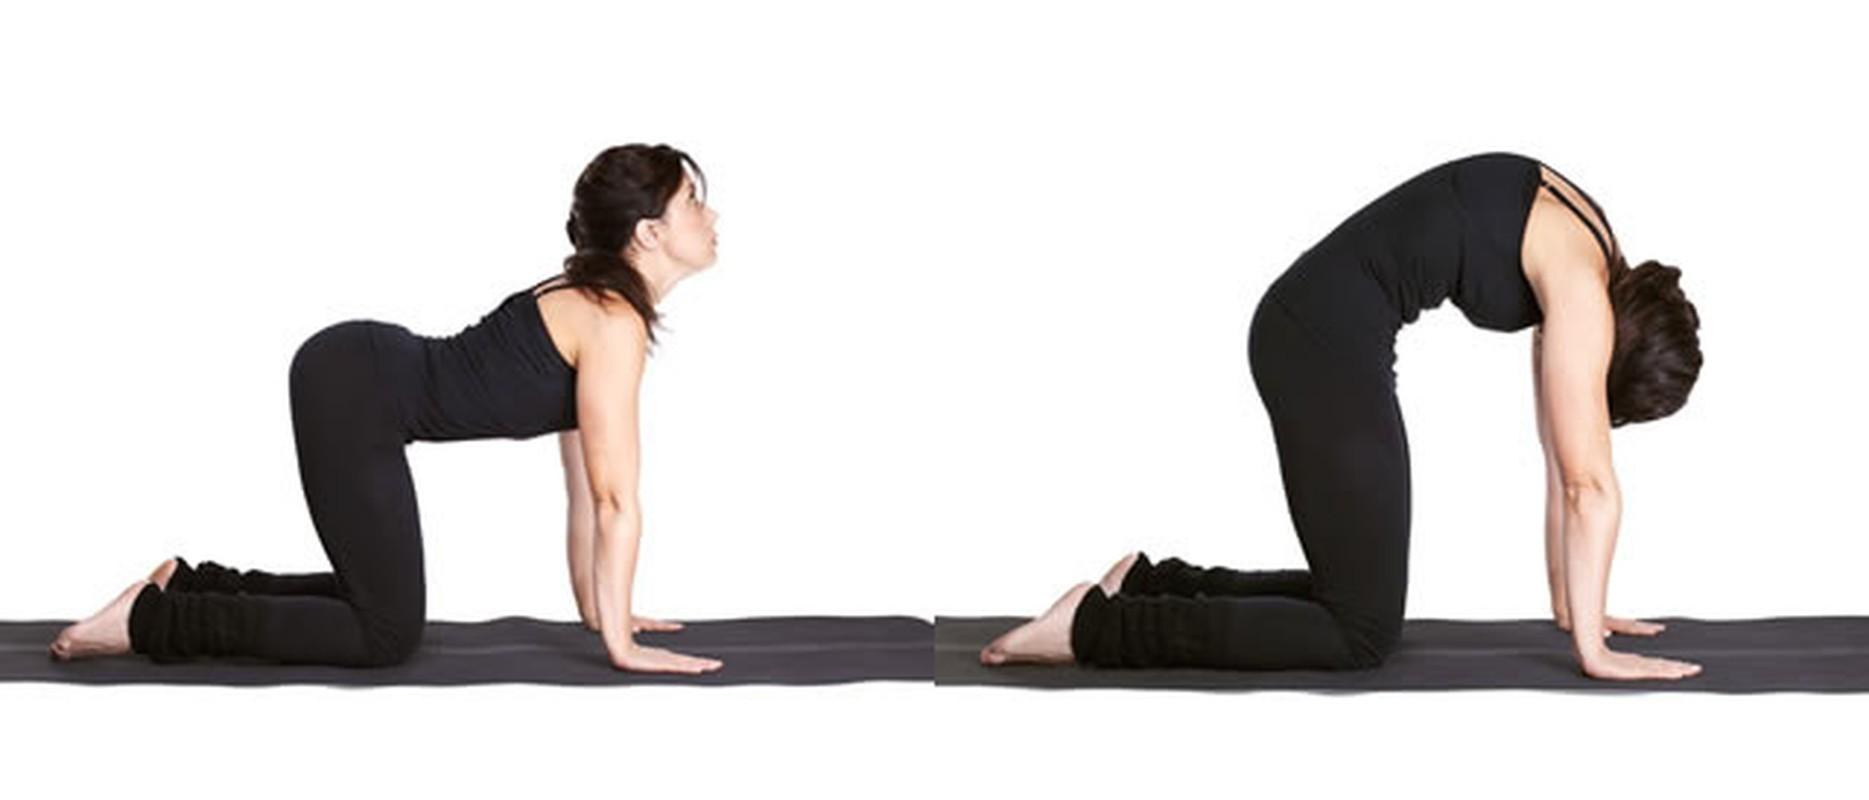 Thuc hanh deu dan 3 bai tap yoga nay cuc tot cho he tieu hoa-Hinh-6